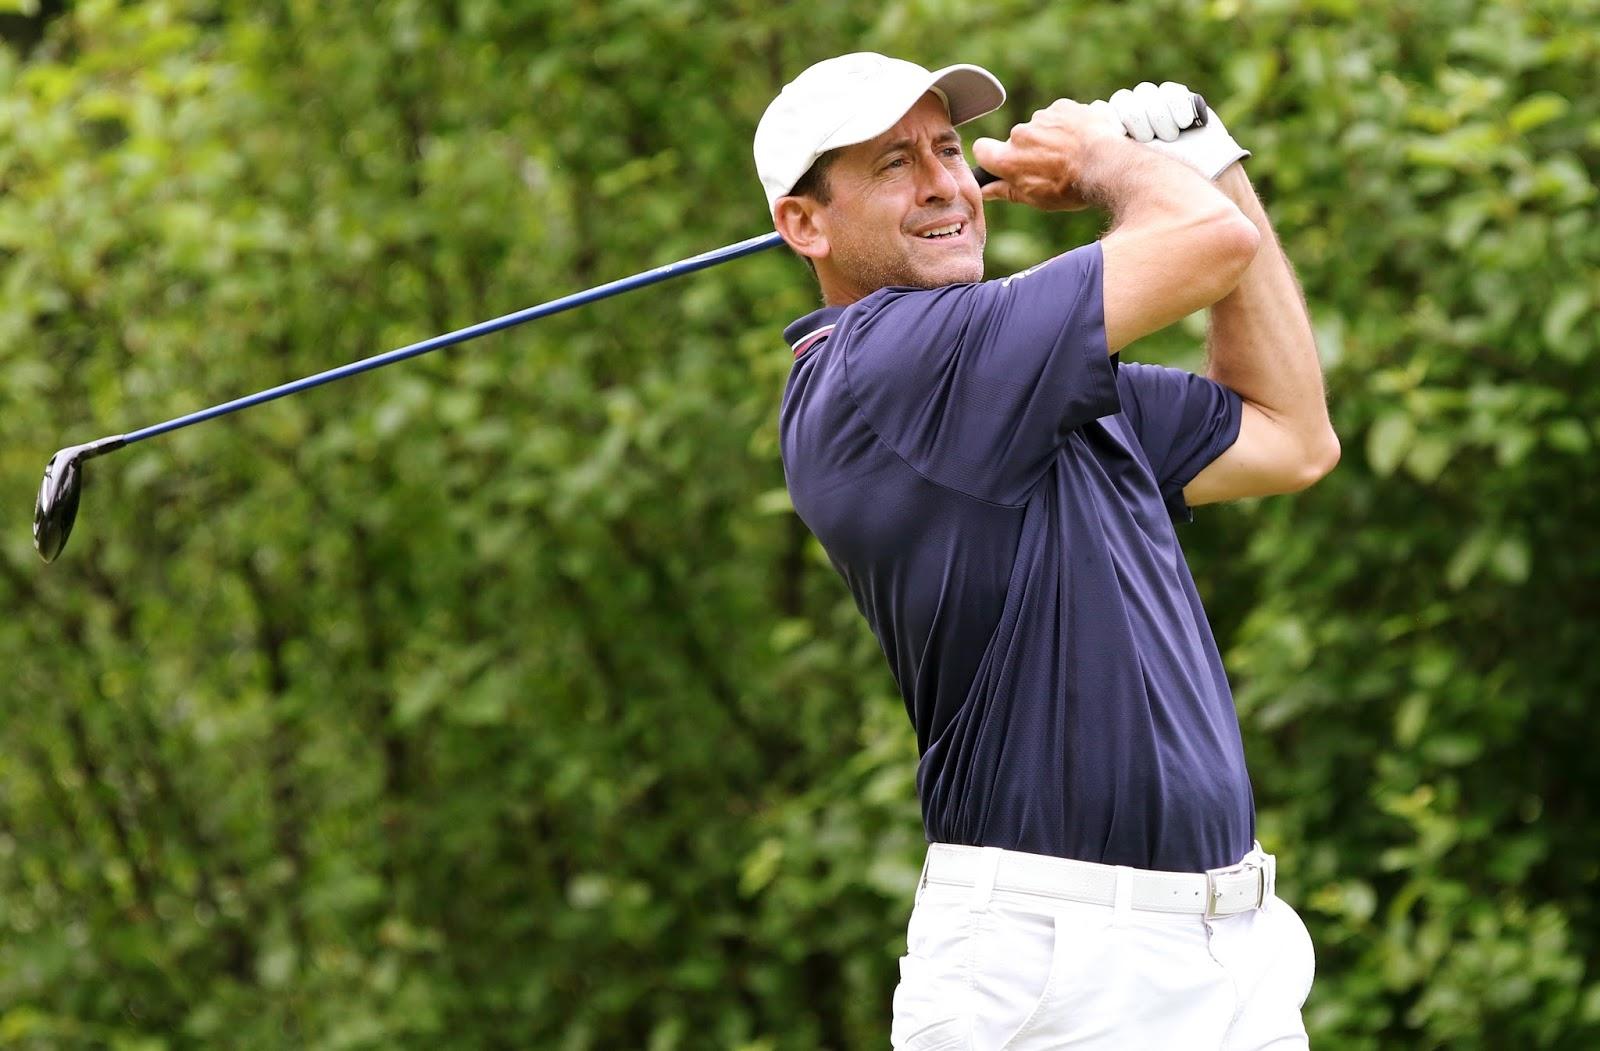 Mark Kodiak Ukena: U.S. Senior Open Qualifier at Northmoor Country Club